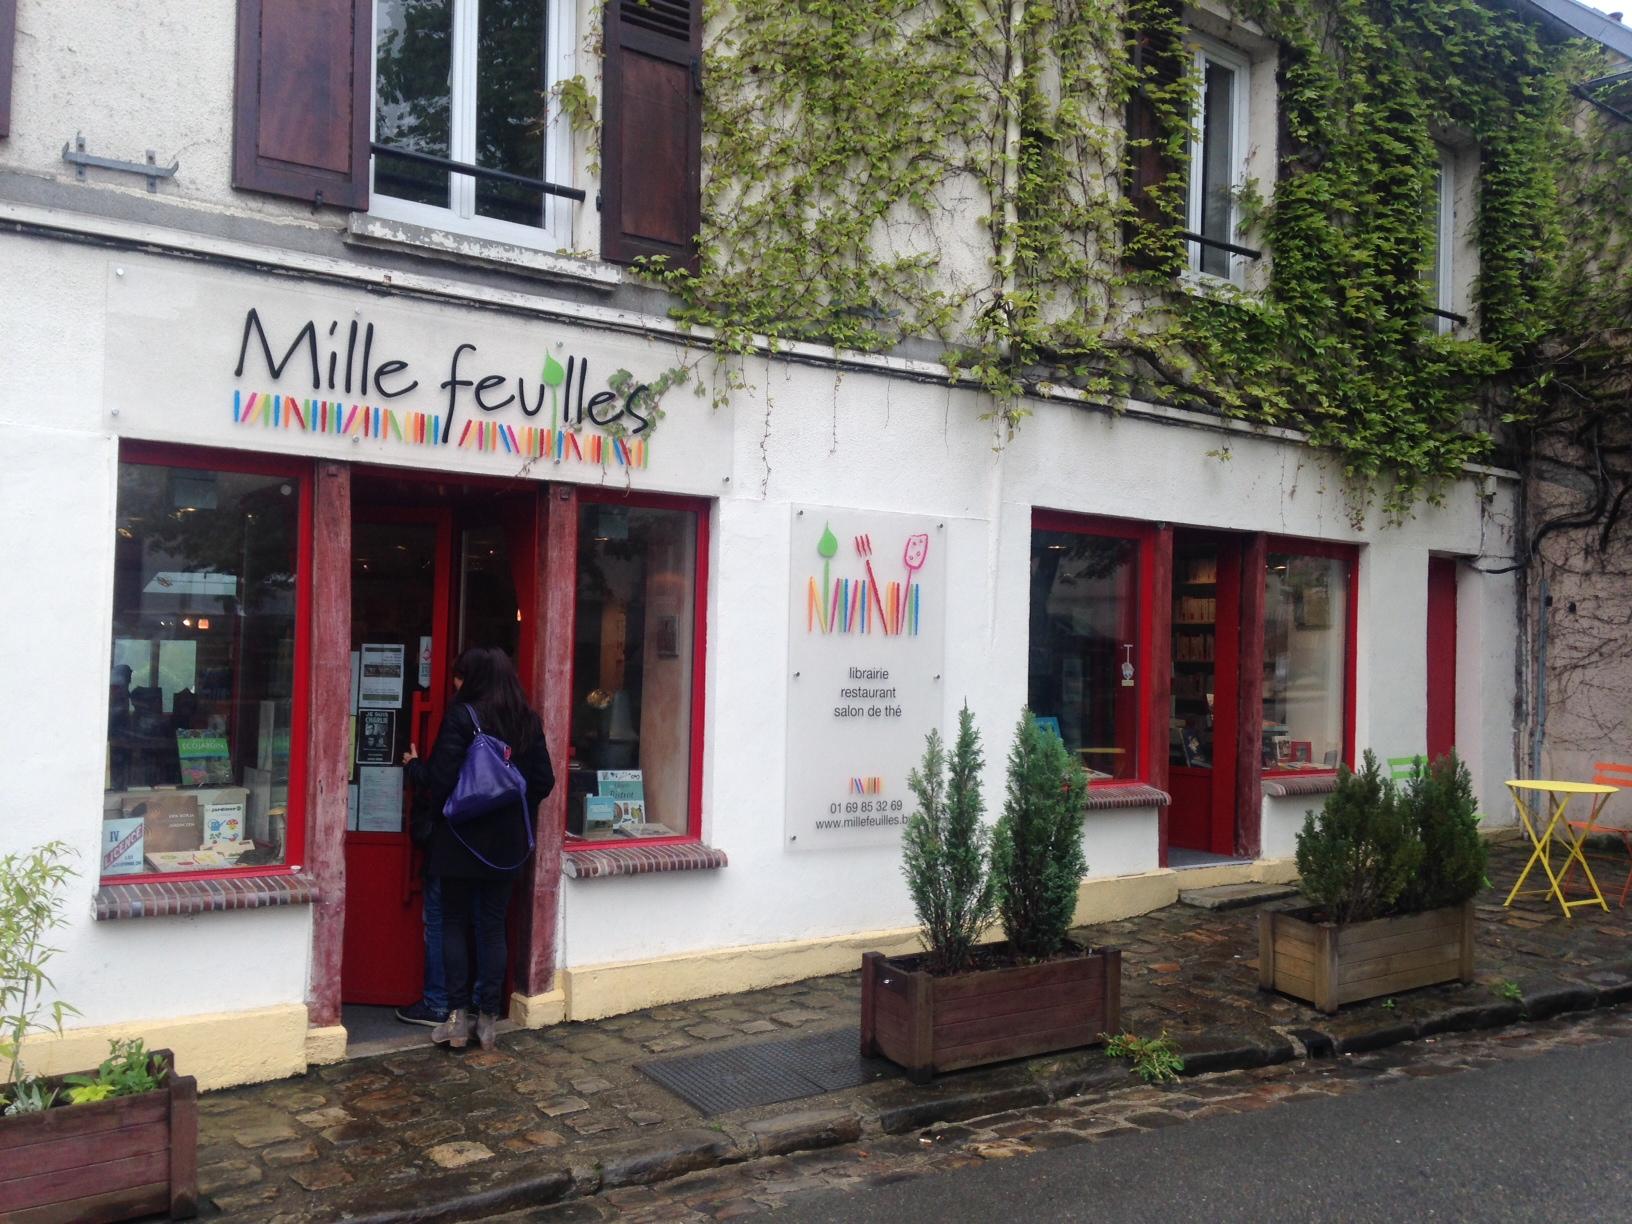 La librairie o il fait bon manger - Librairie salon de the ...